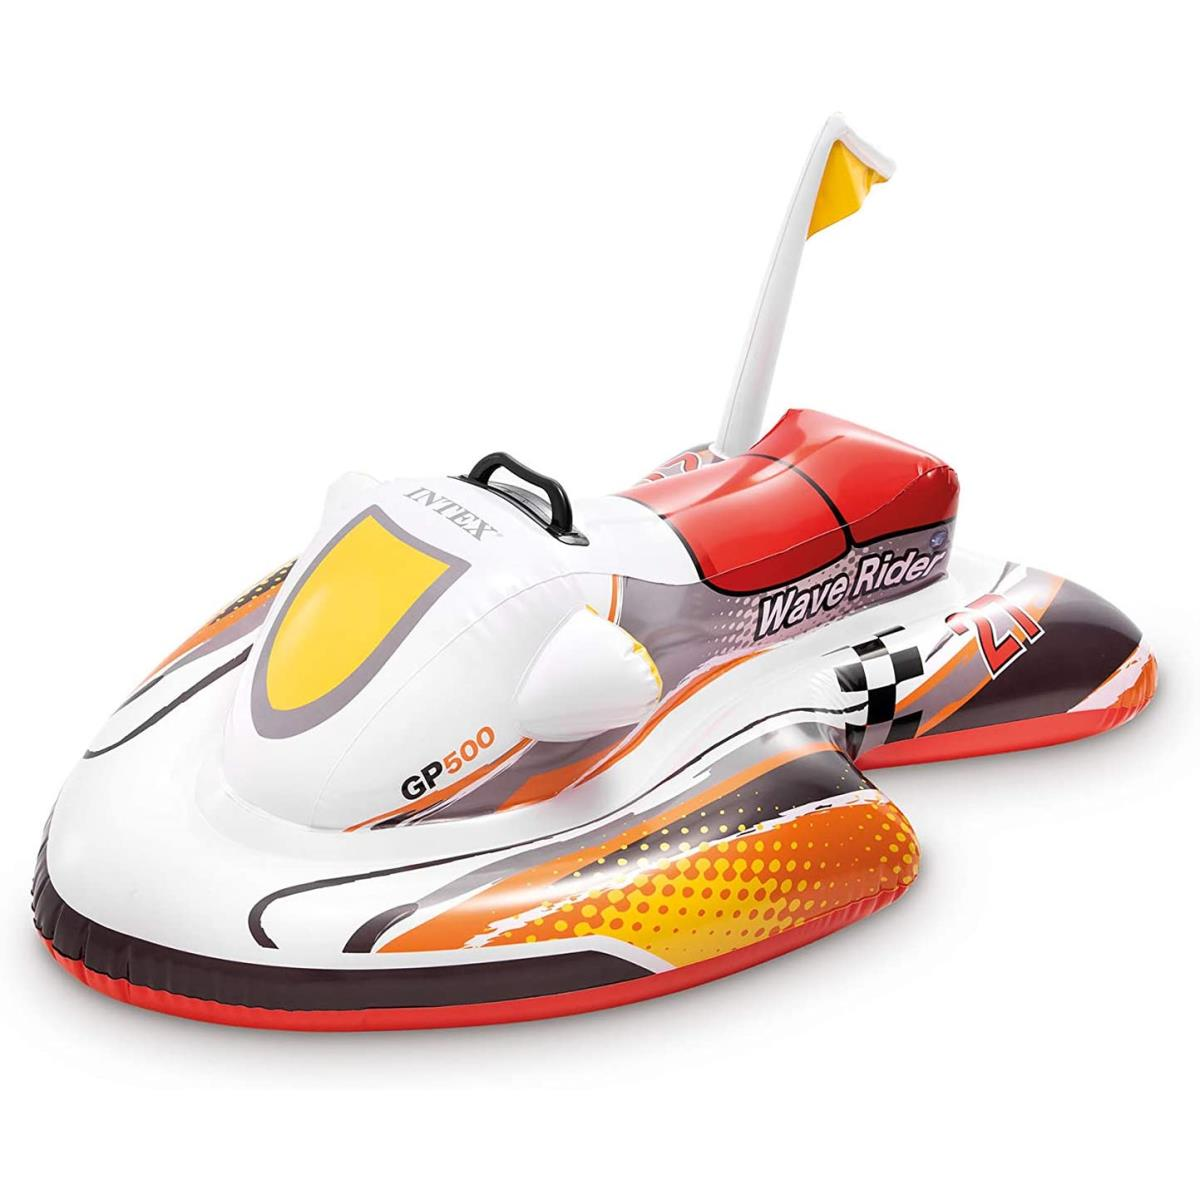 Intex aufblasbares Wasserspielzeug Jetski Jetrider Wave Rider 117 x 77 cm,Intex ,57520NP, 6941057457543